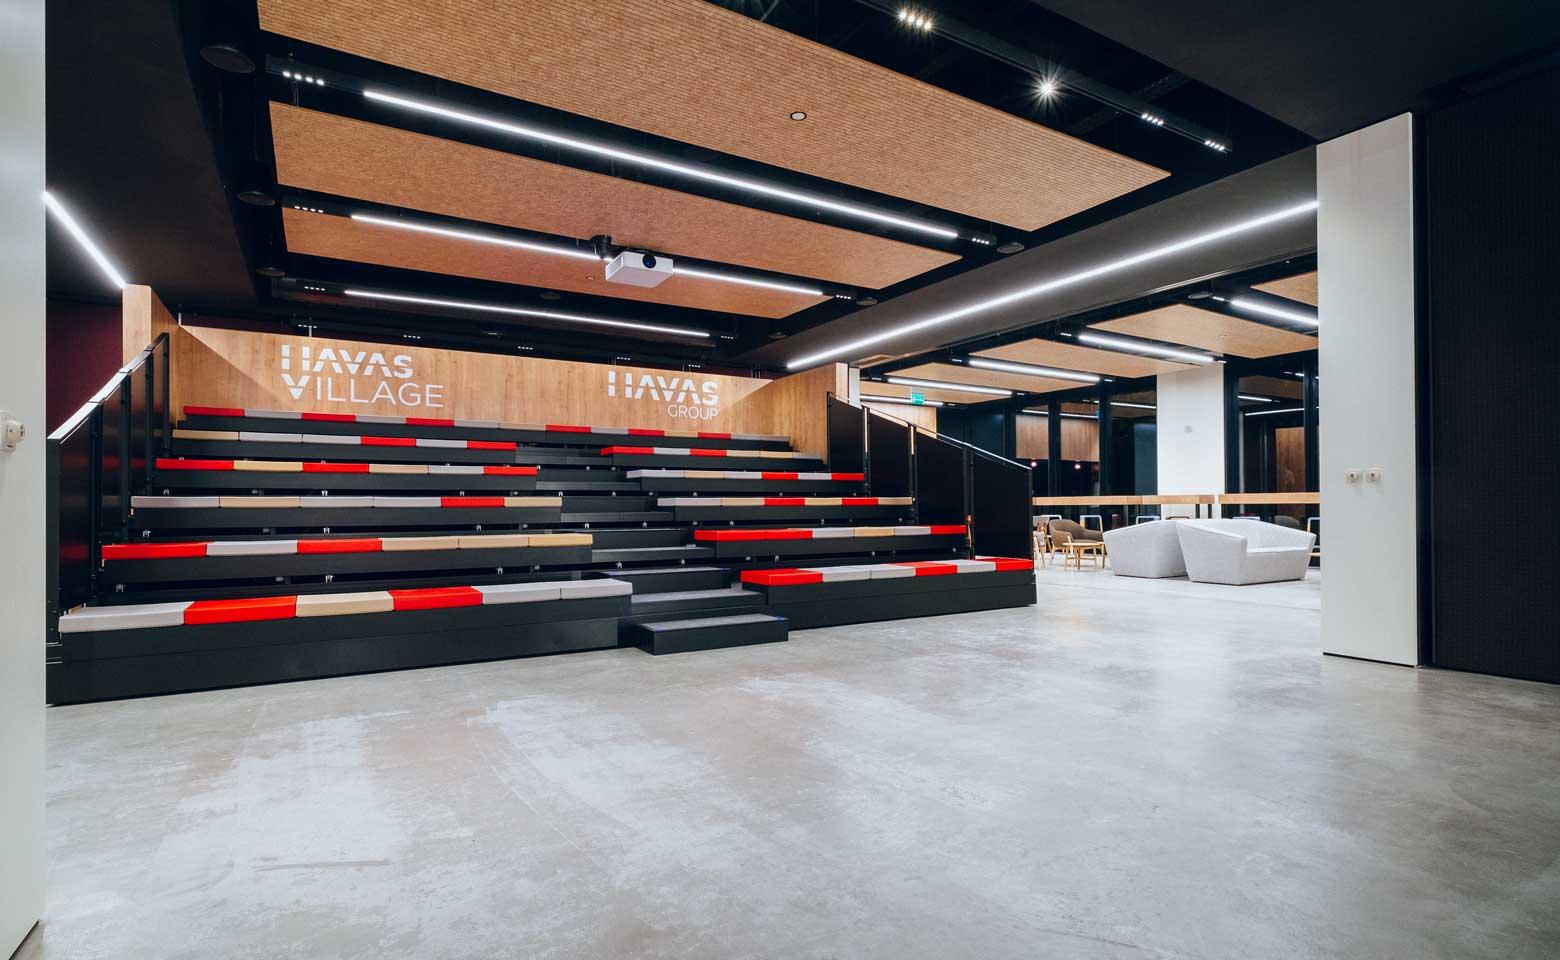 CW-nuevas-oficinas-havas-group-havas-village-madrid-auditorio